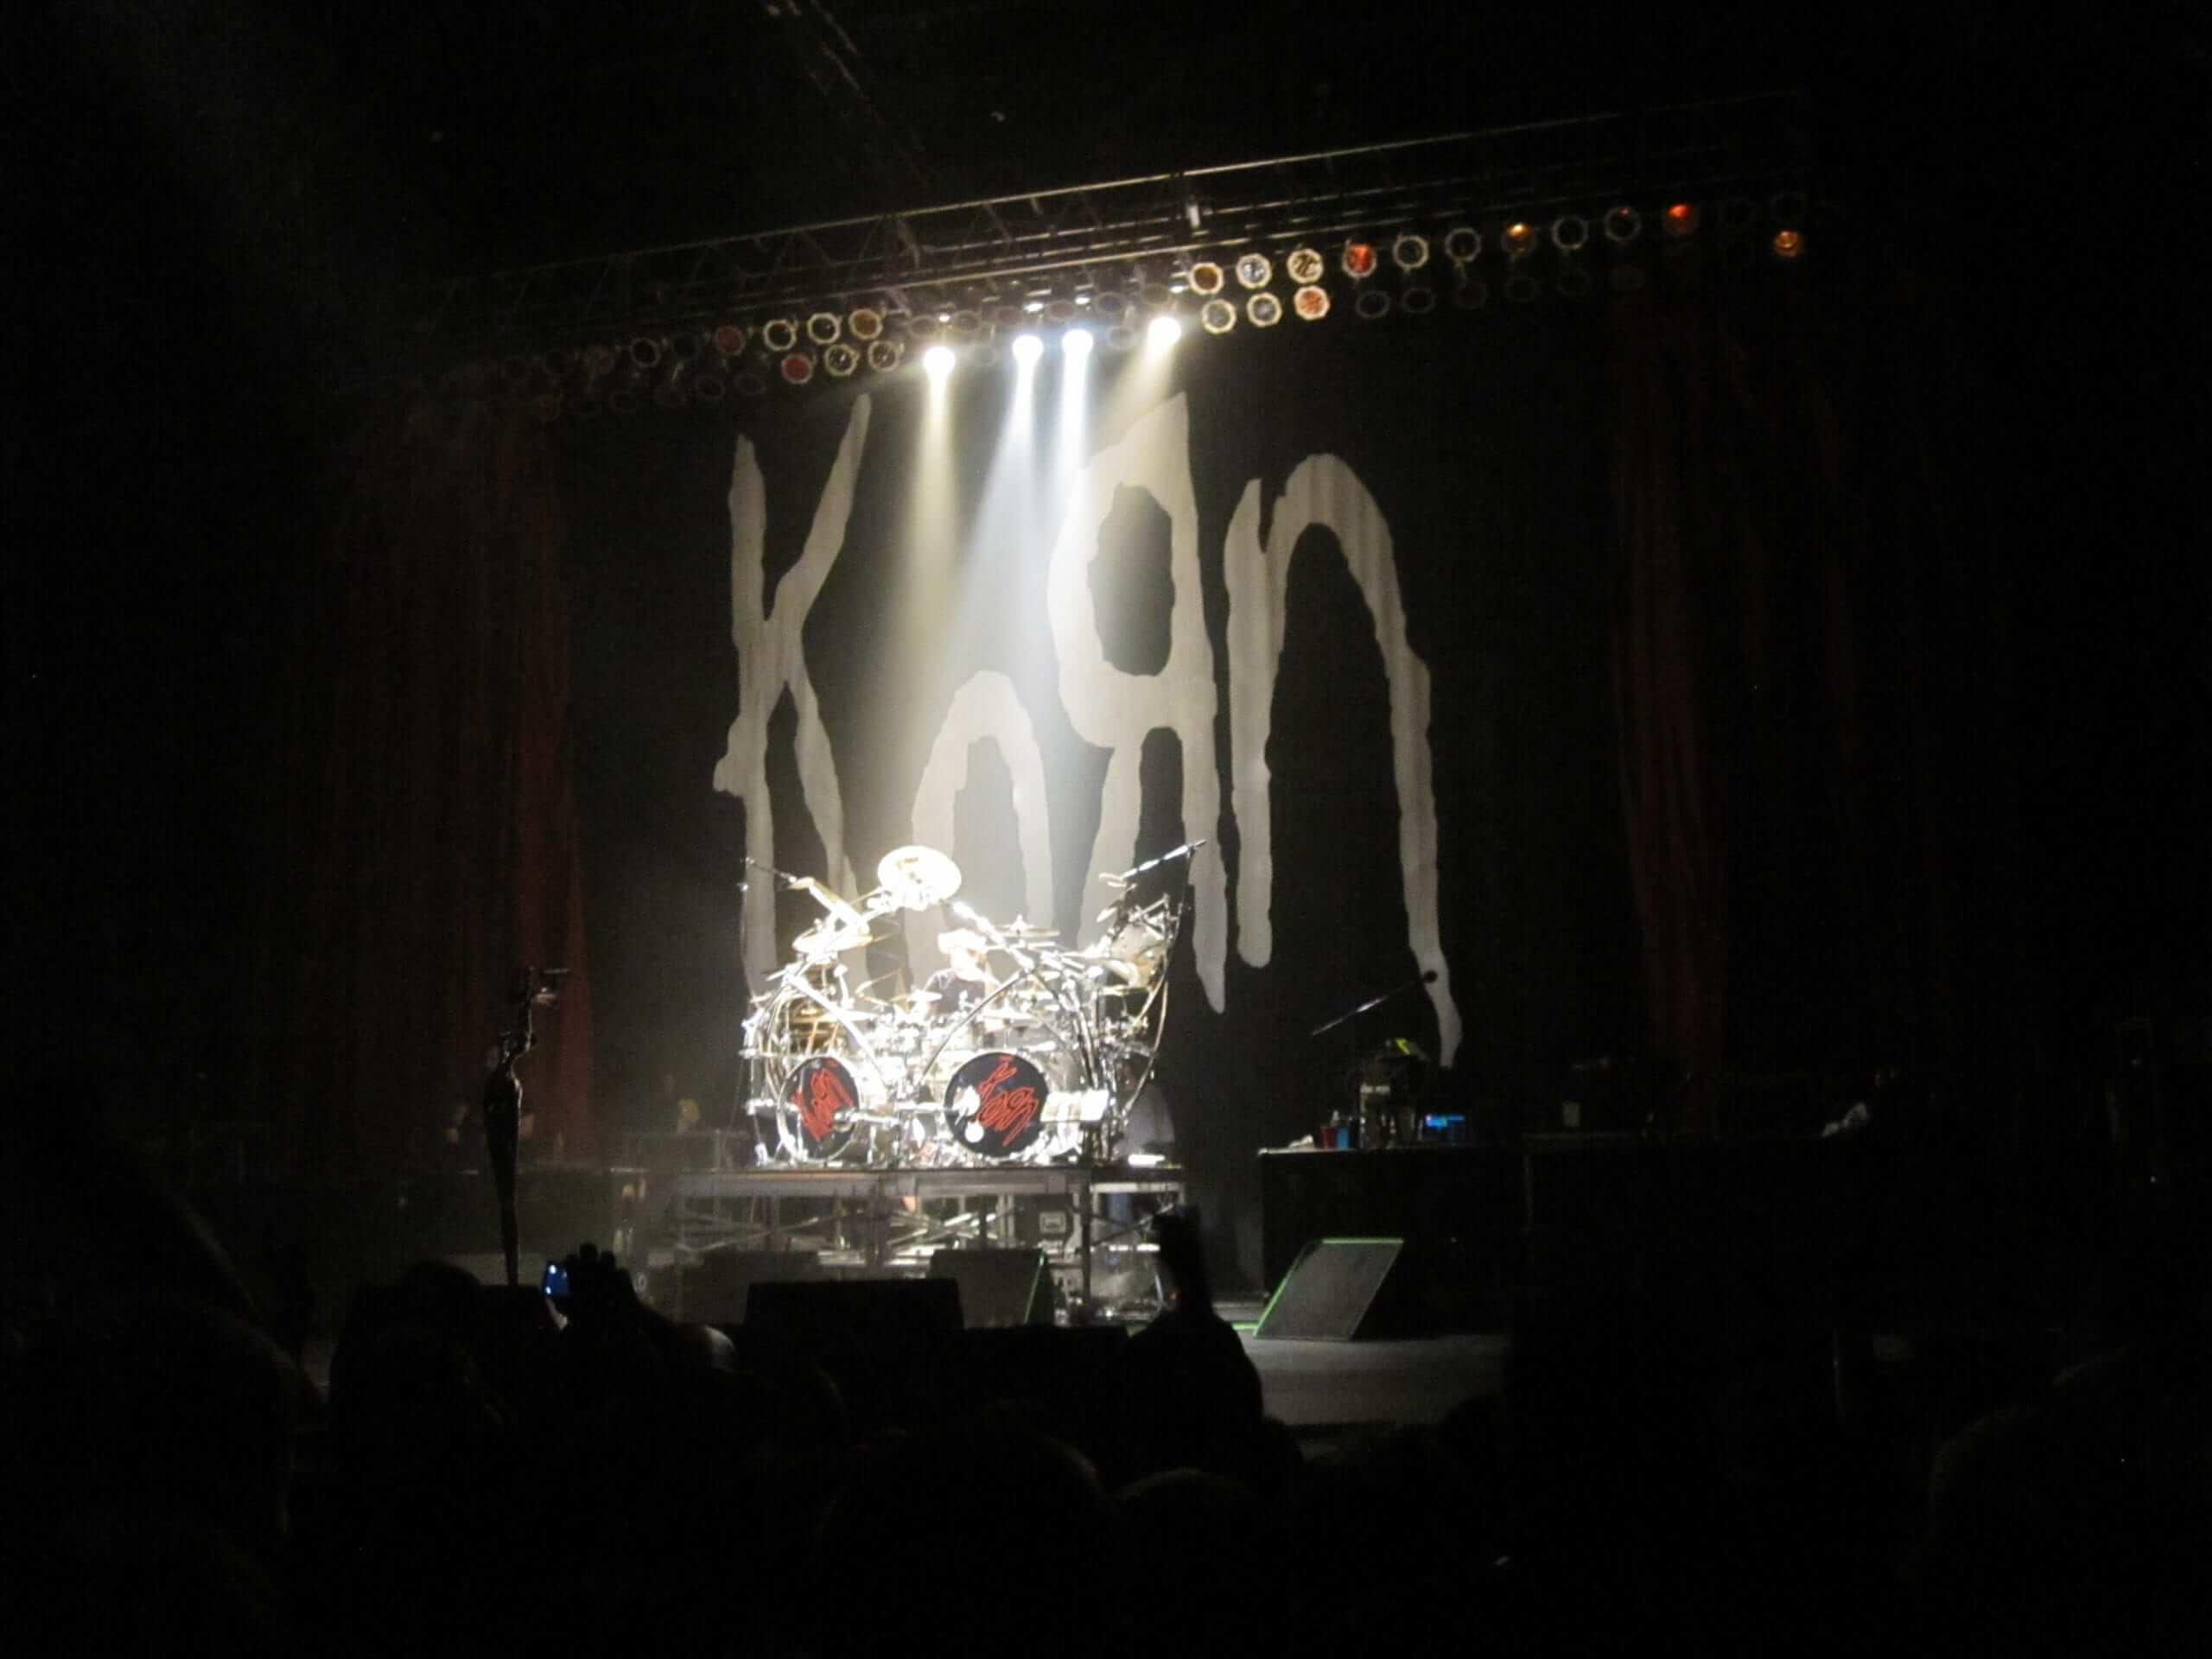 Korn @Verizon Wireless